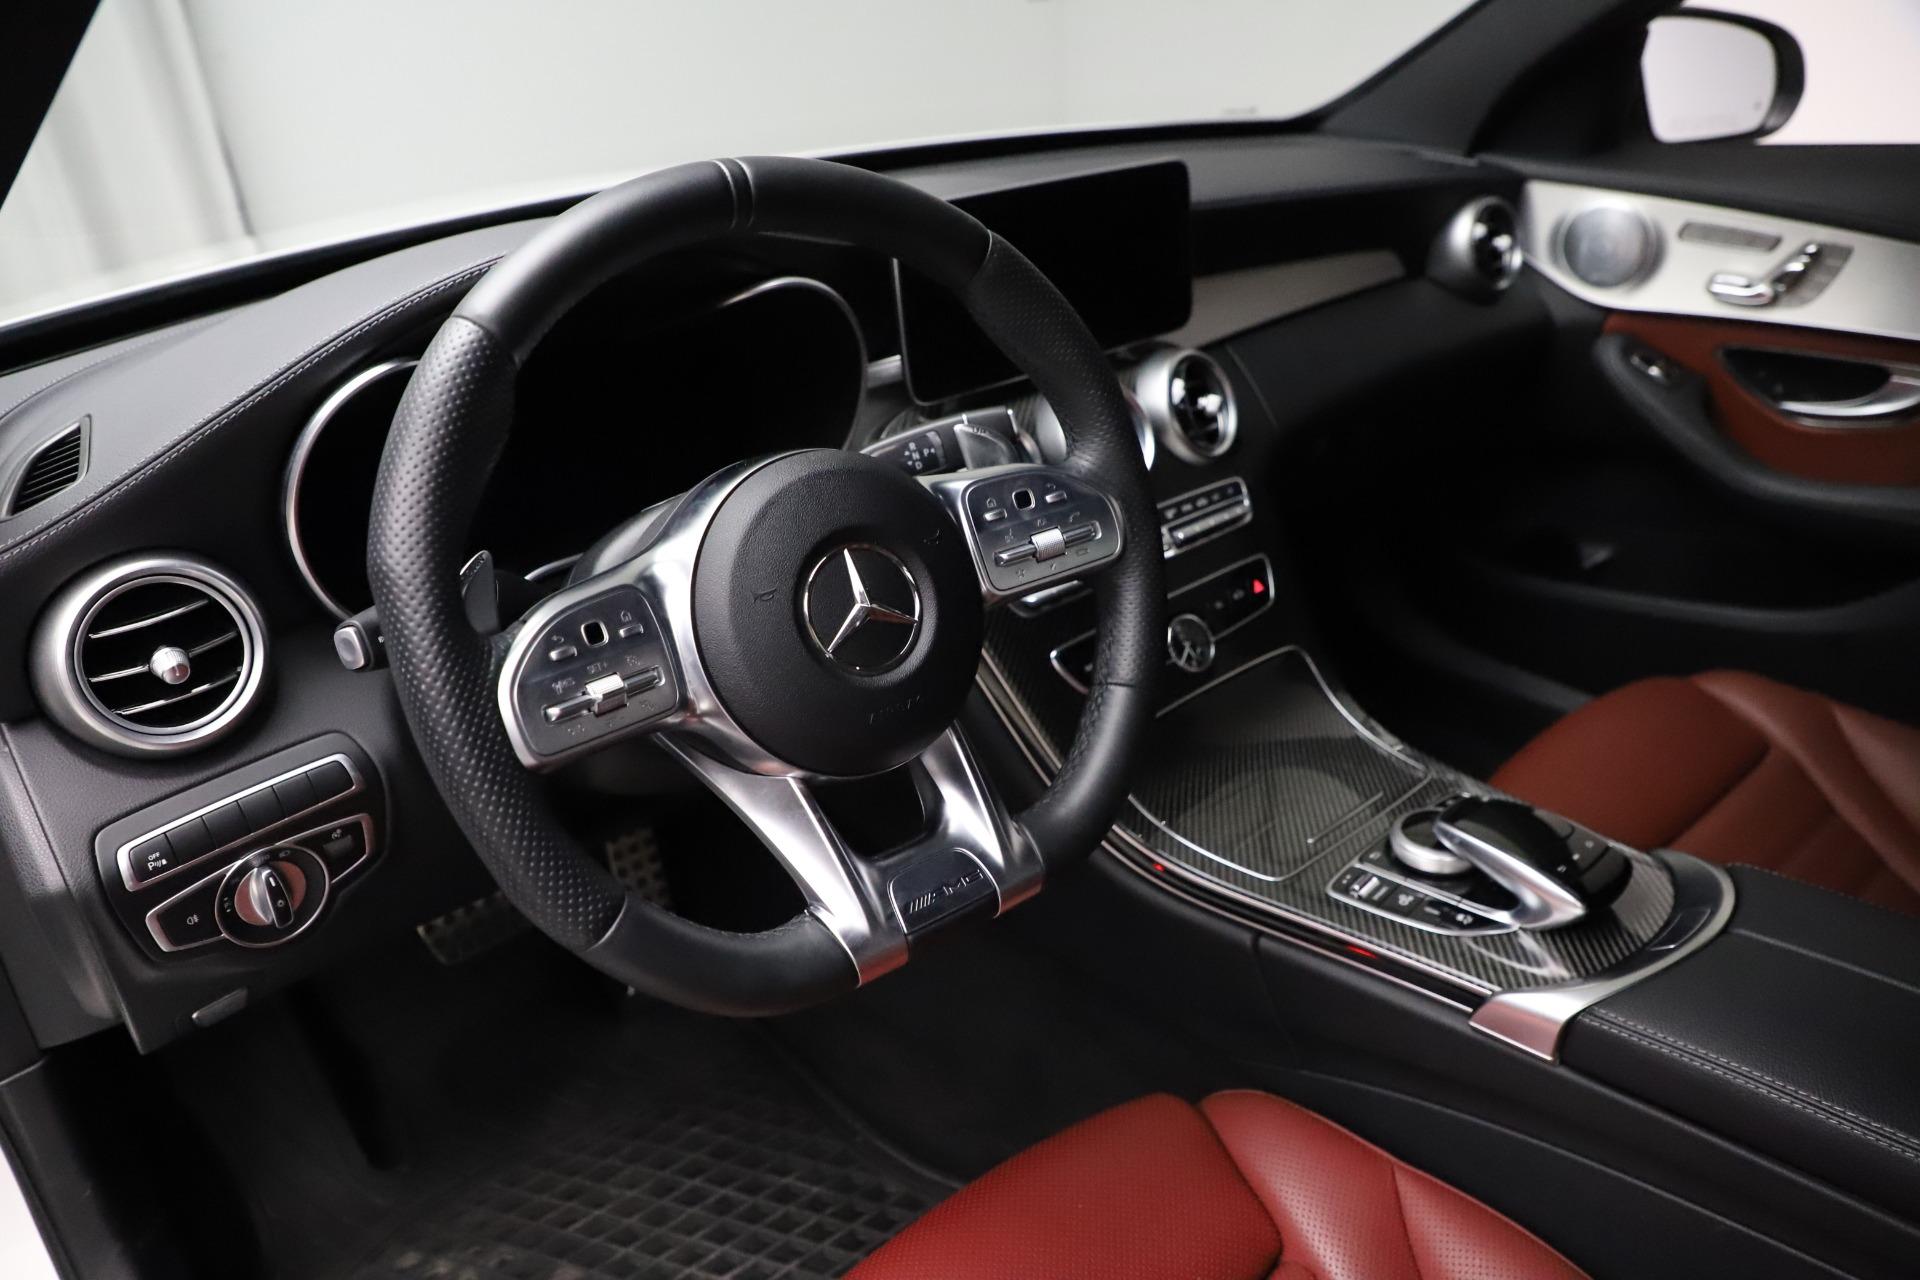 Used 2019 Mercedes Benz C Class AMG C 43